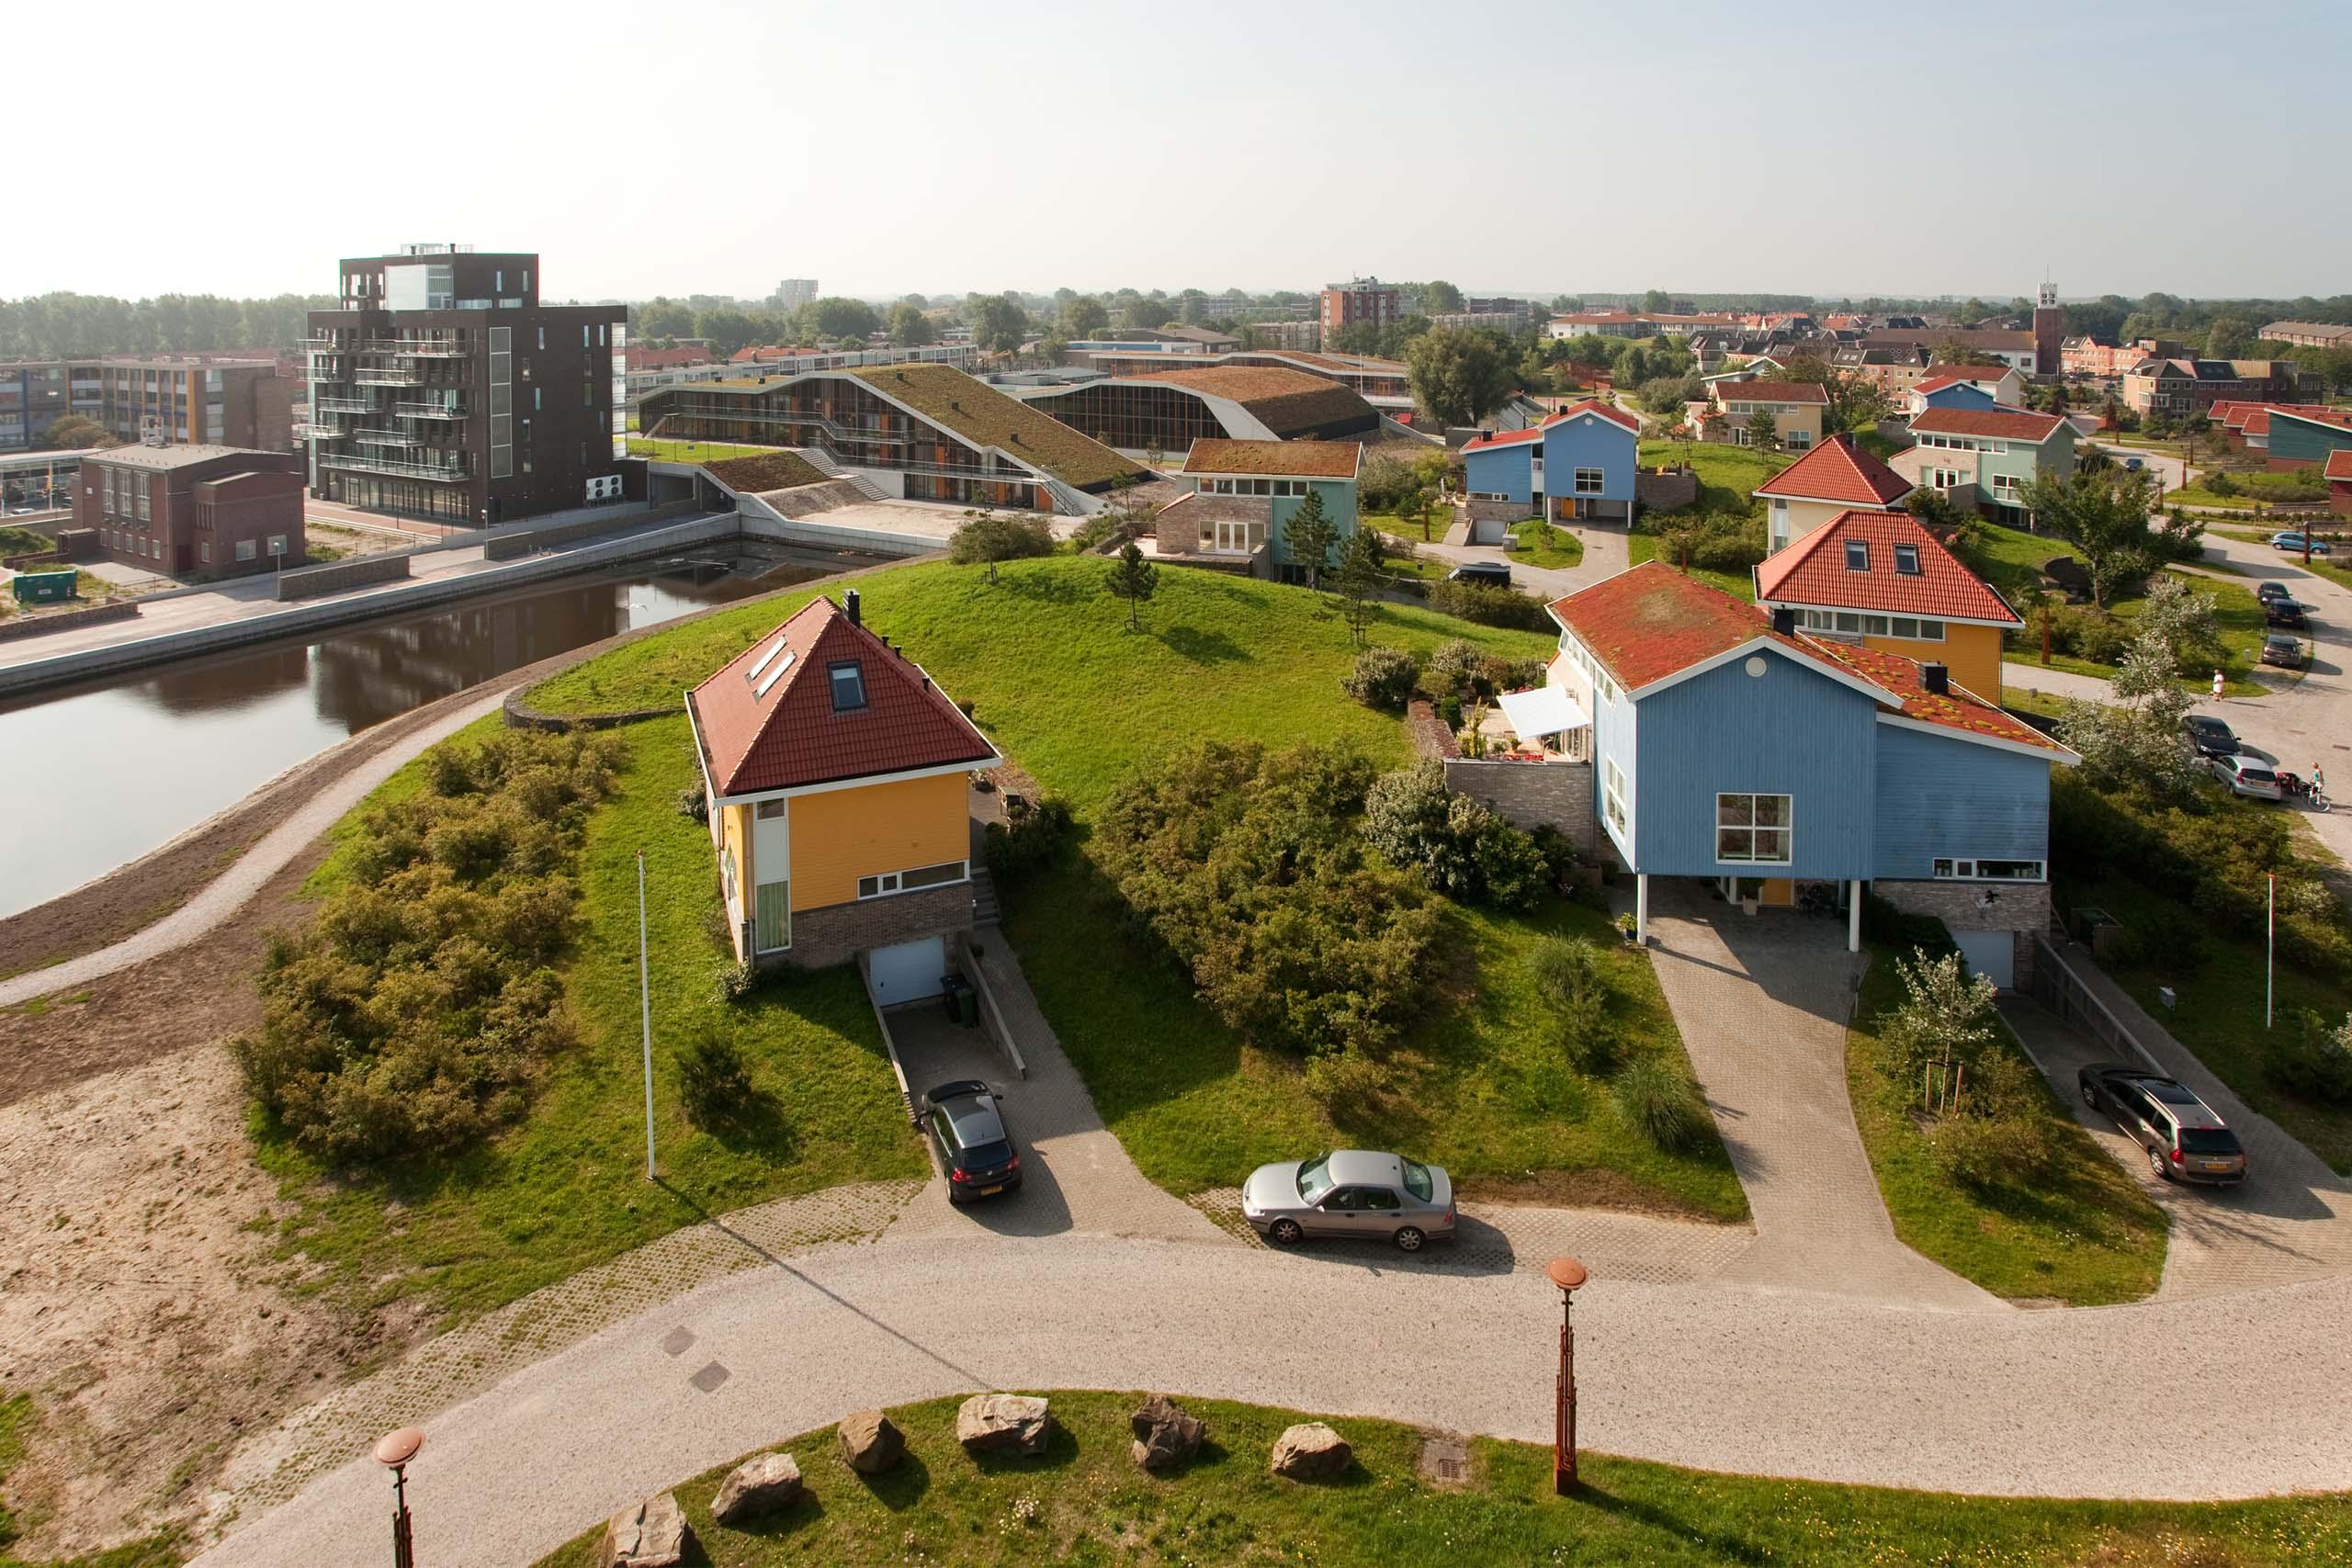 woningbouw woningen duinen park duinpark herstructurering Den Helder